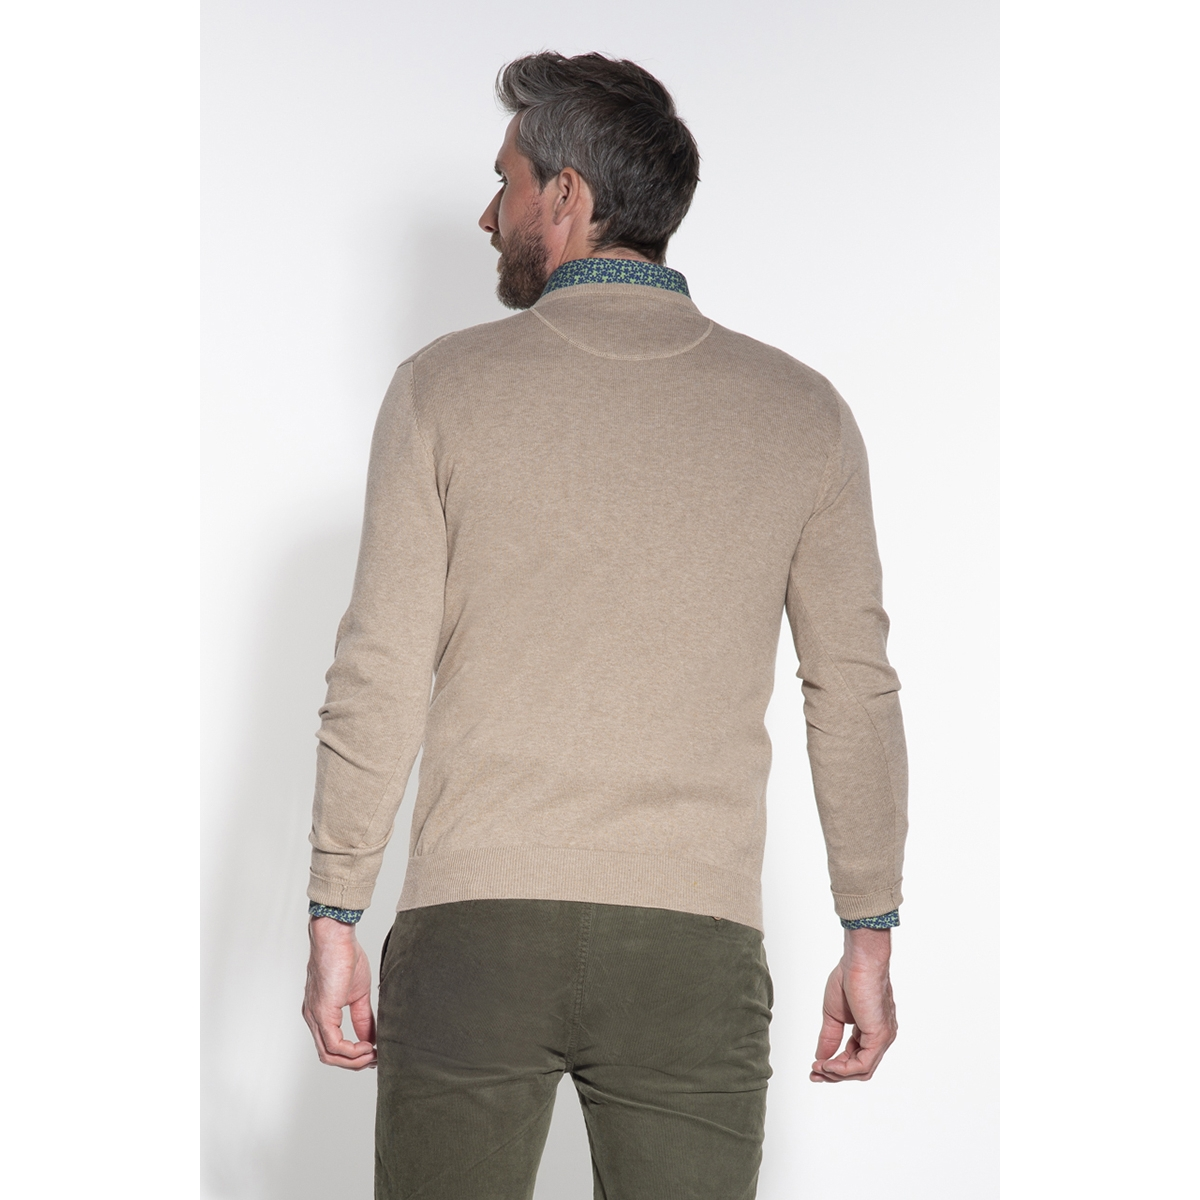 classic pullover v hals 044530 campbell trui 004 beige